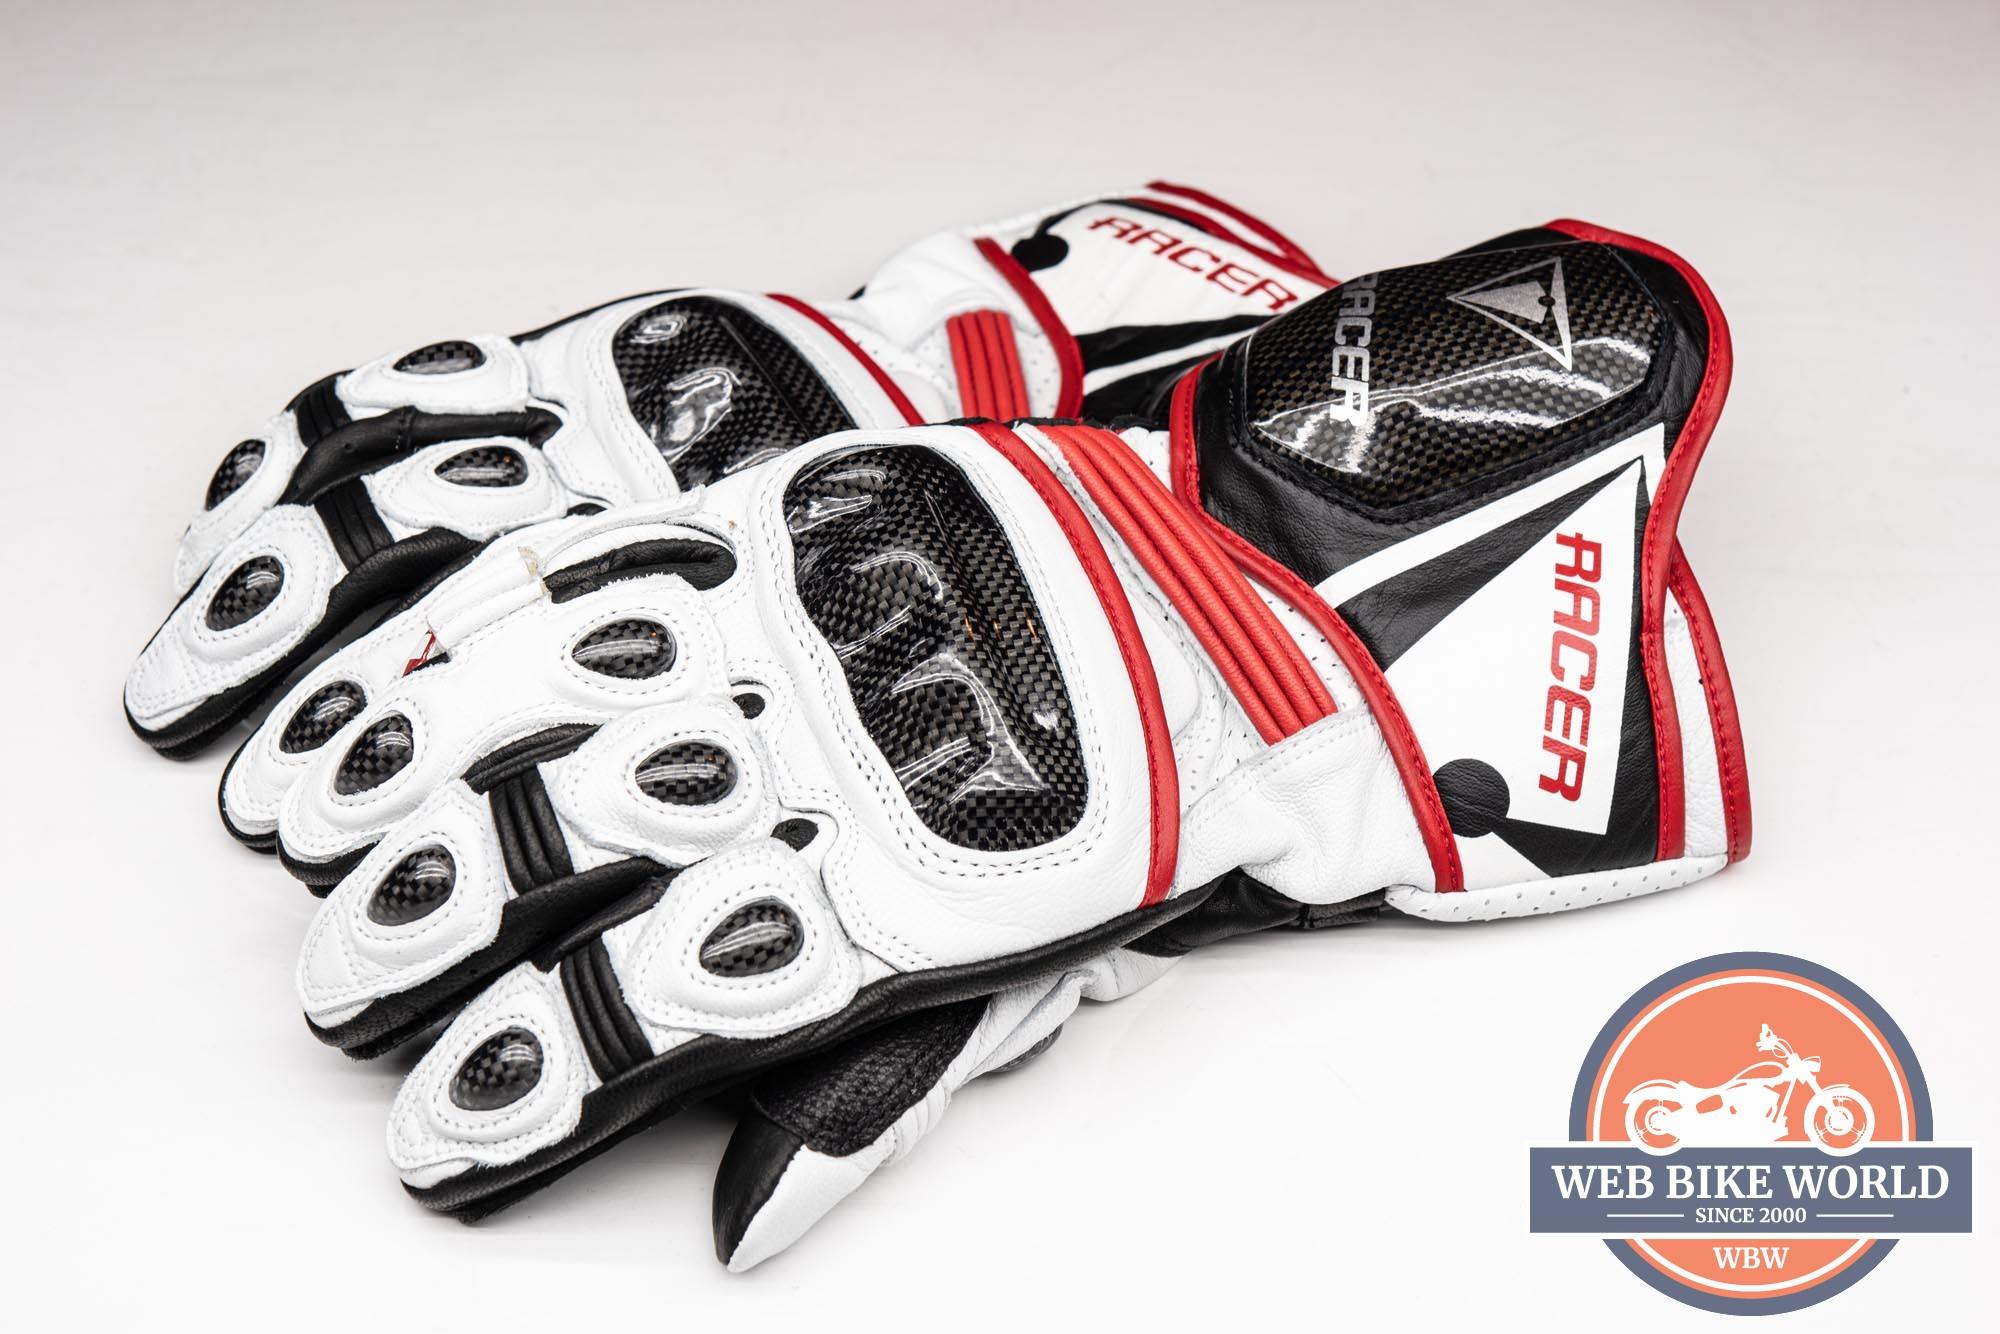 Racer USA Hi-Per Gloves Review